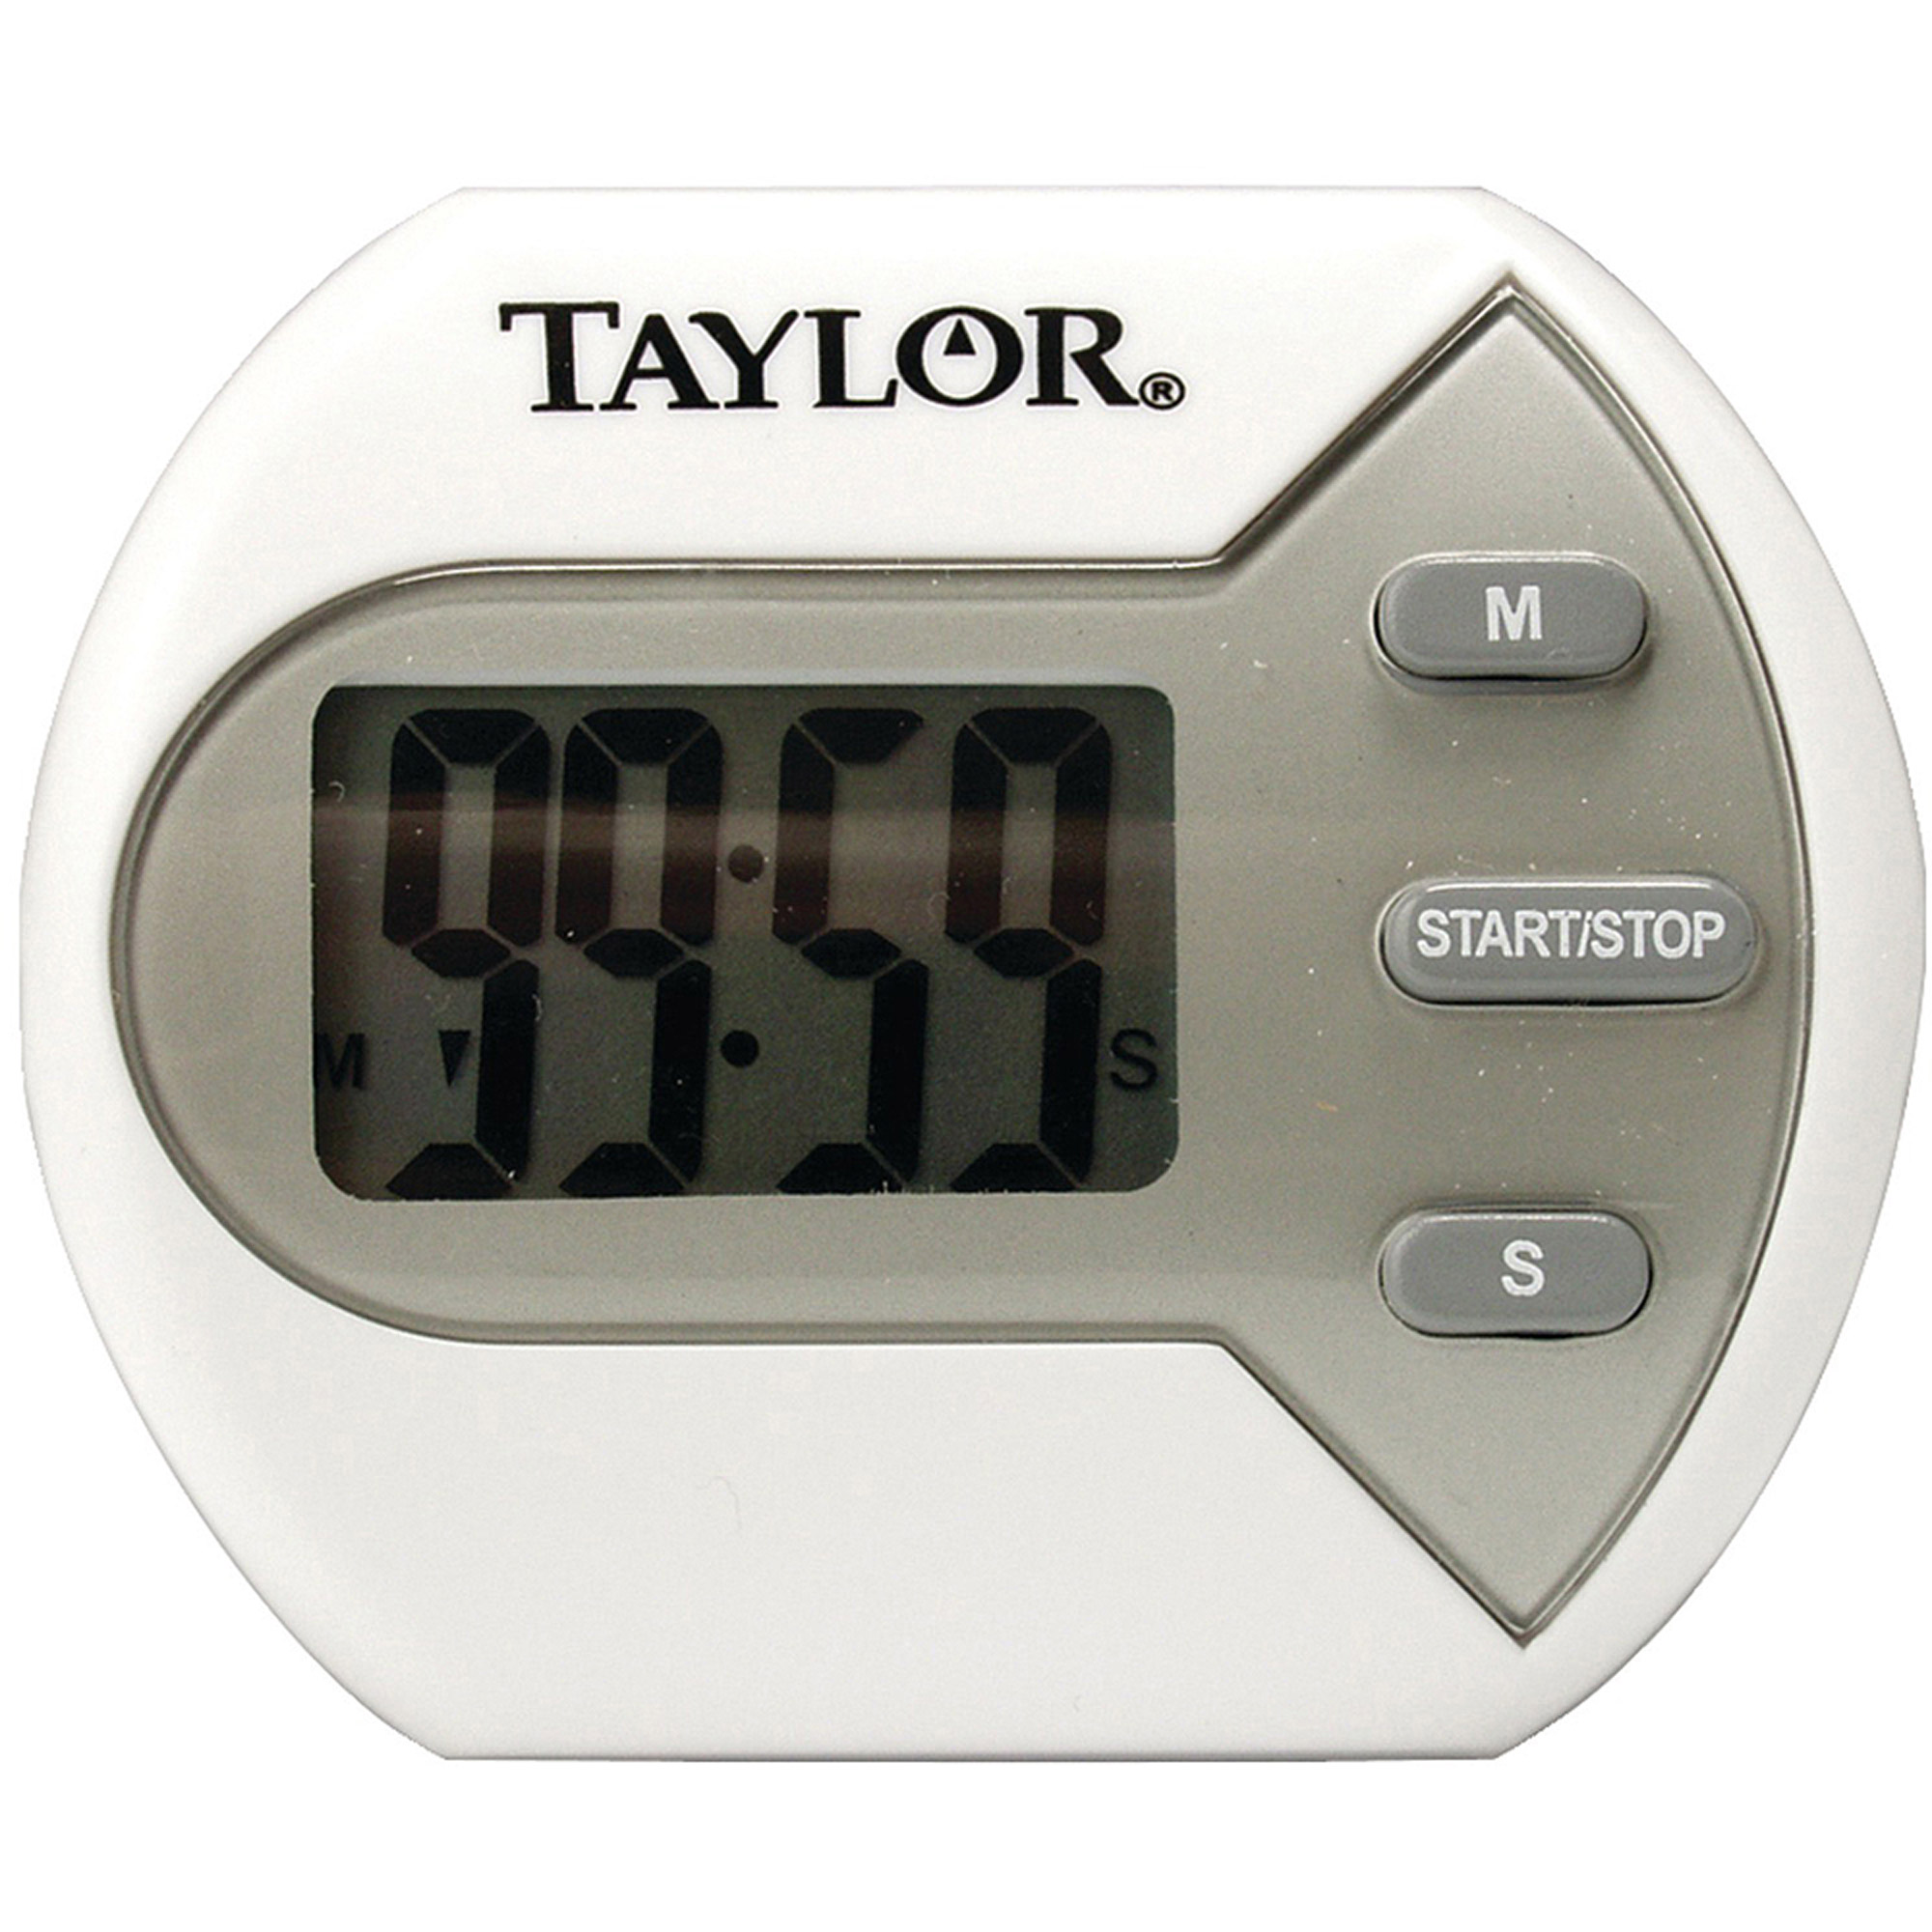 Taylor 5806 Digital Timer - Walmart.com